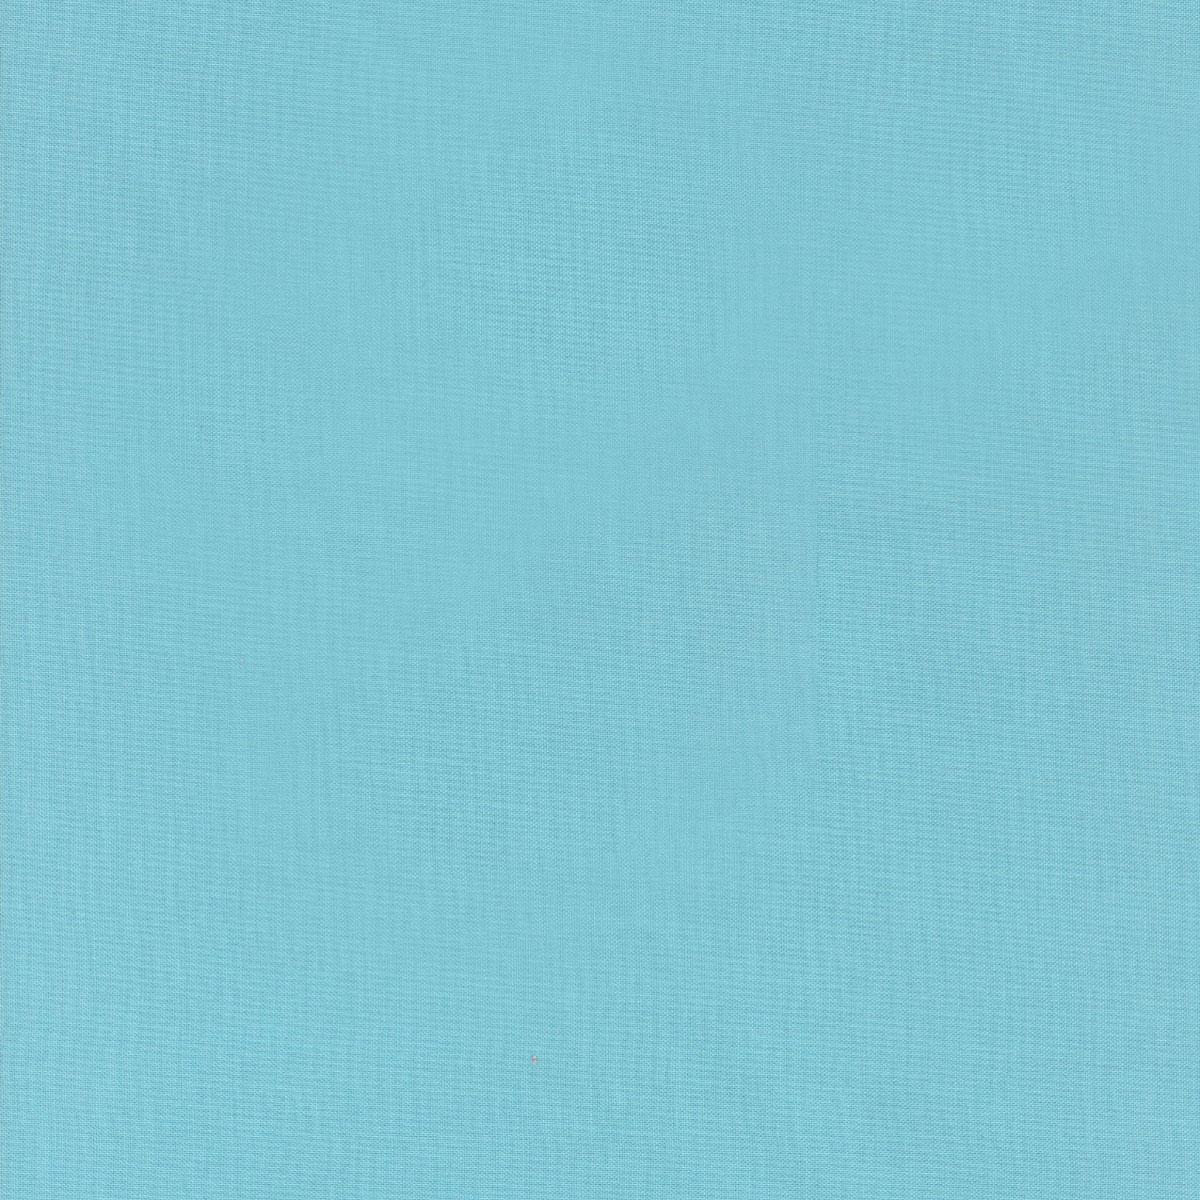 Bloomingville Deko-Apfel Beton 10x12cm